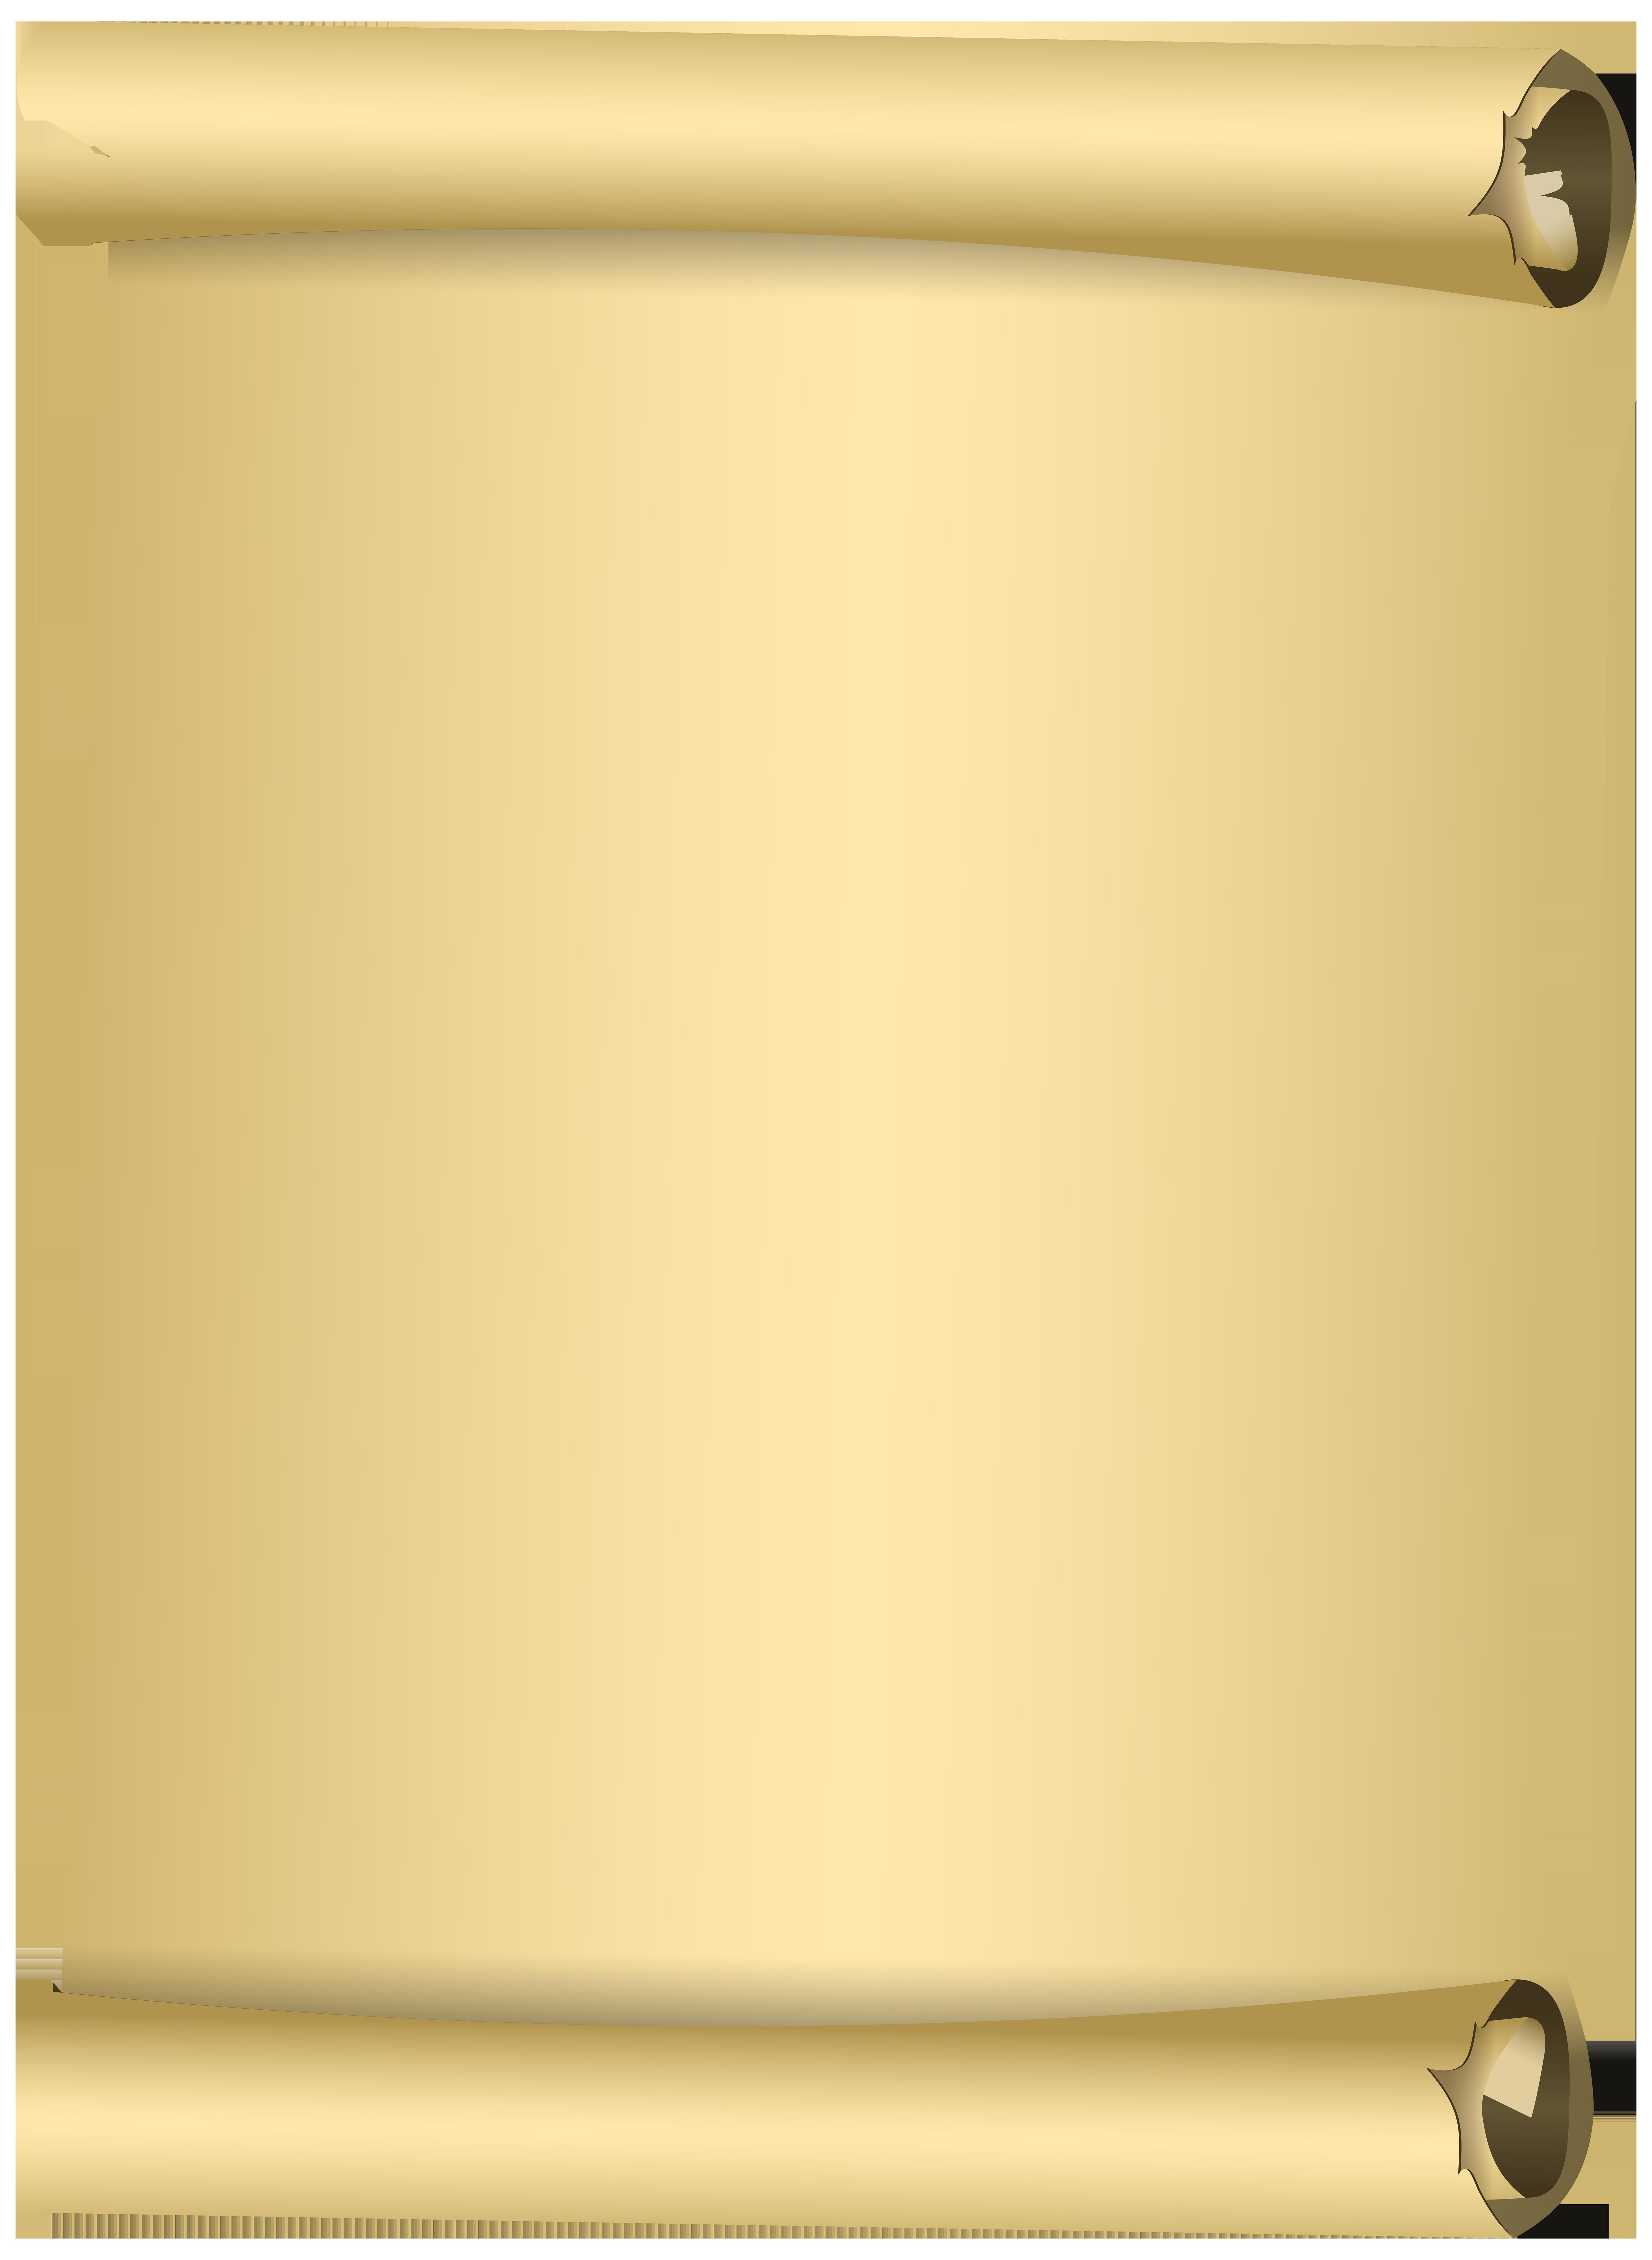 Scroll clip art image